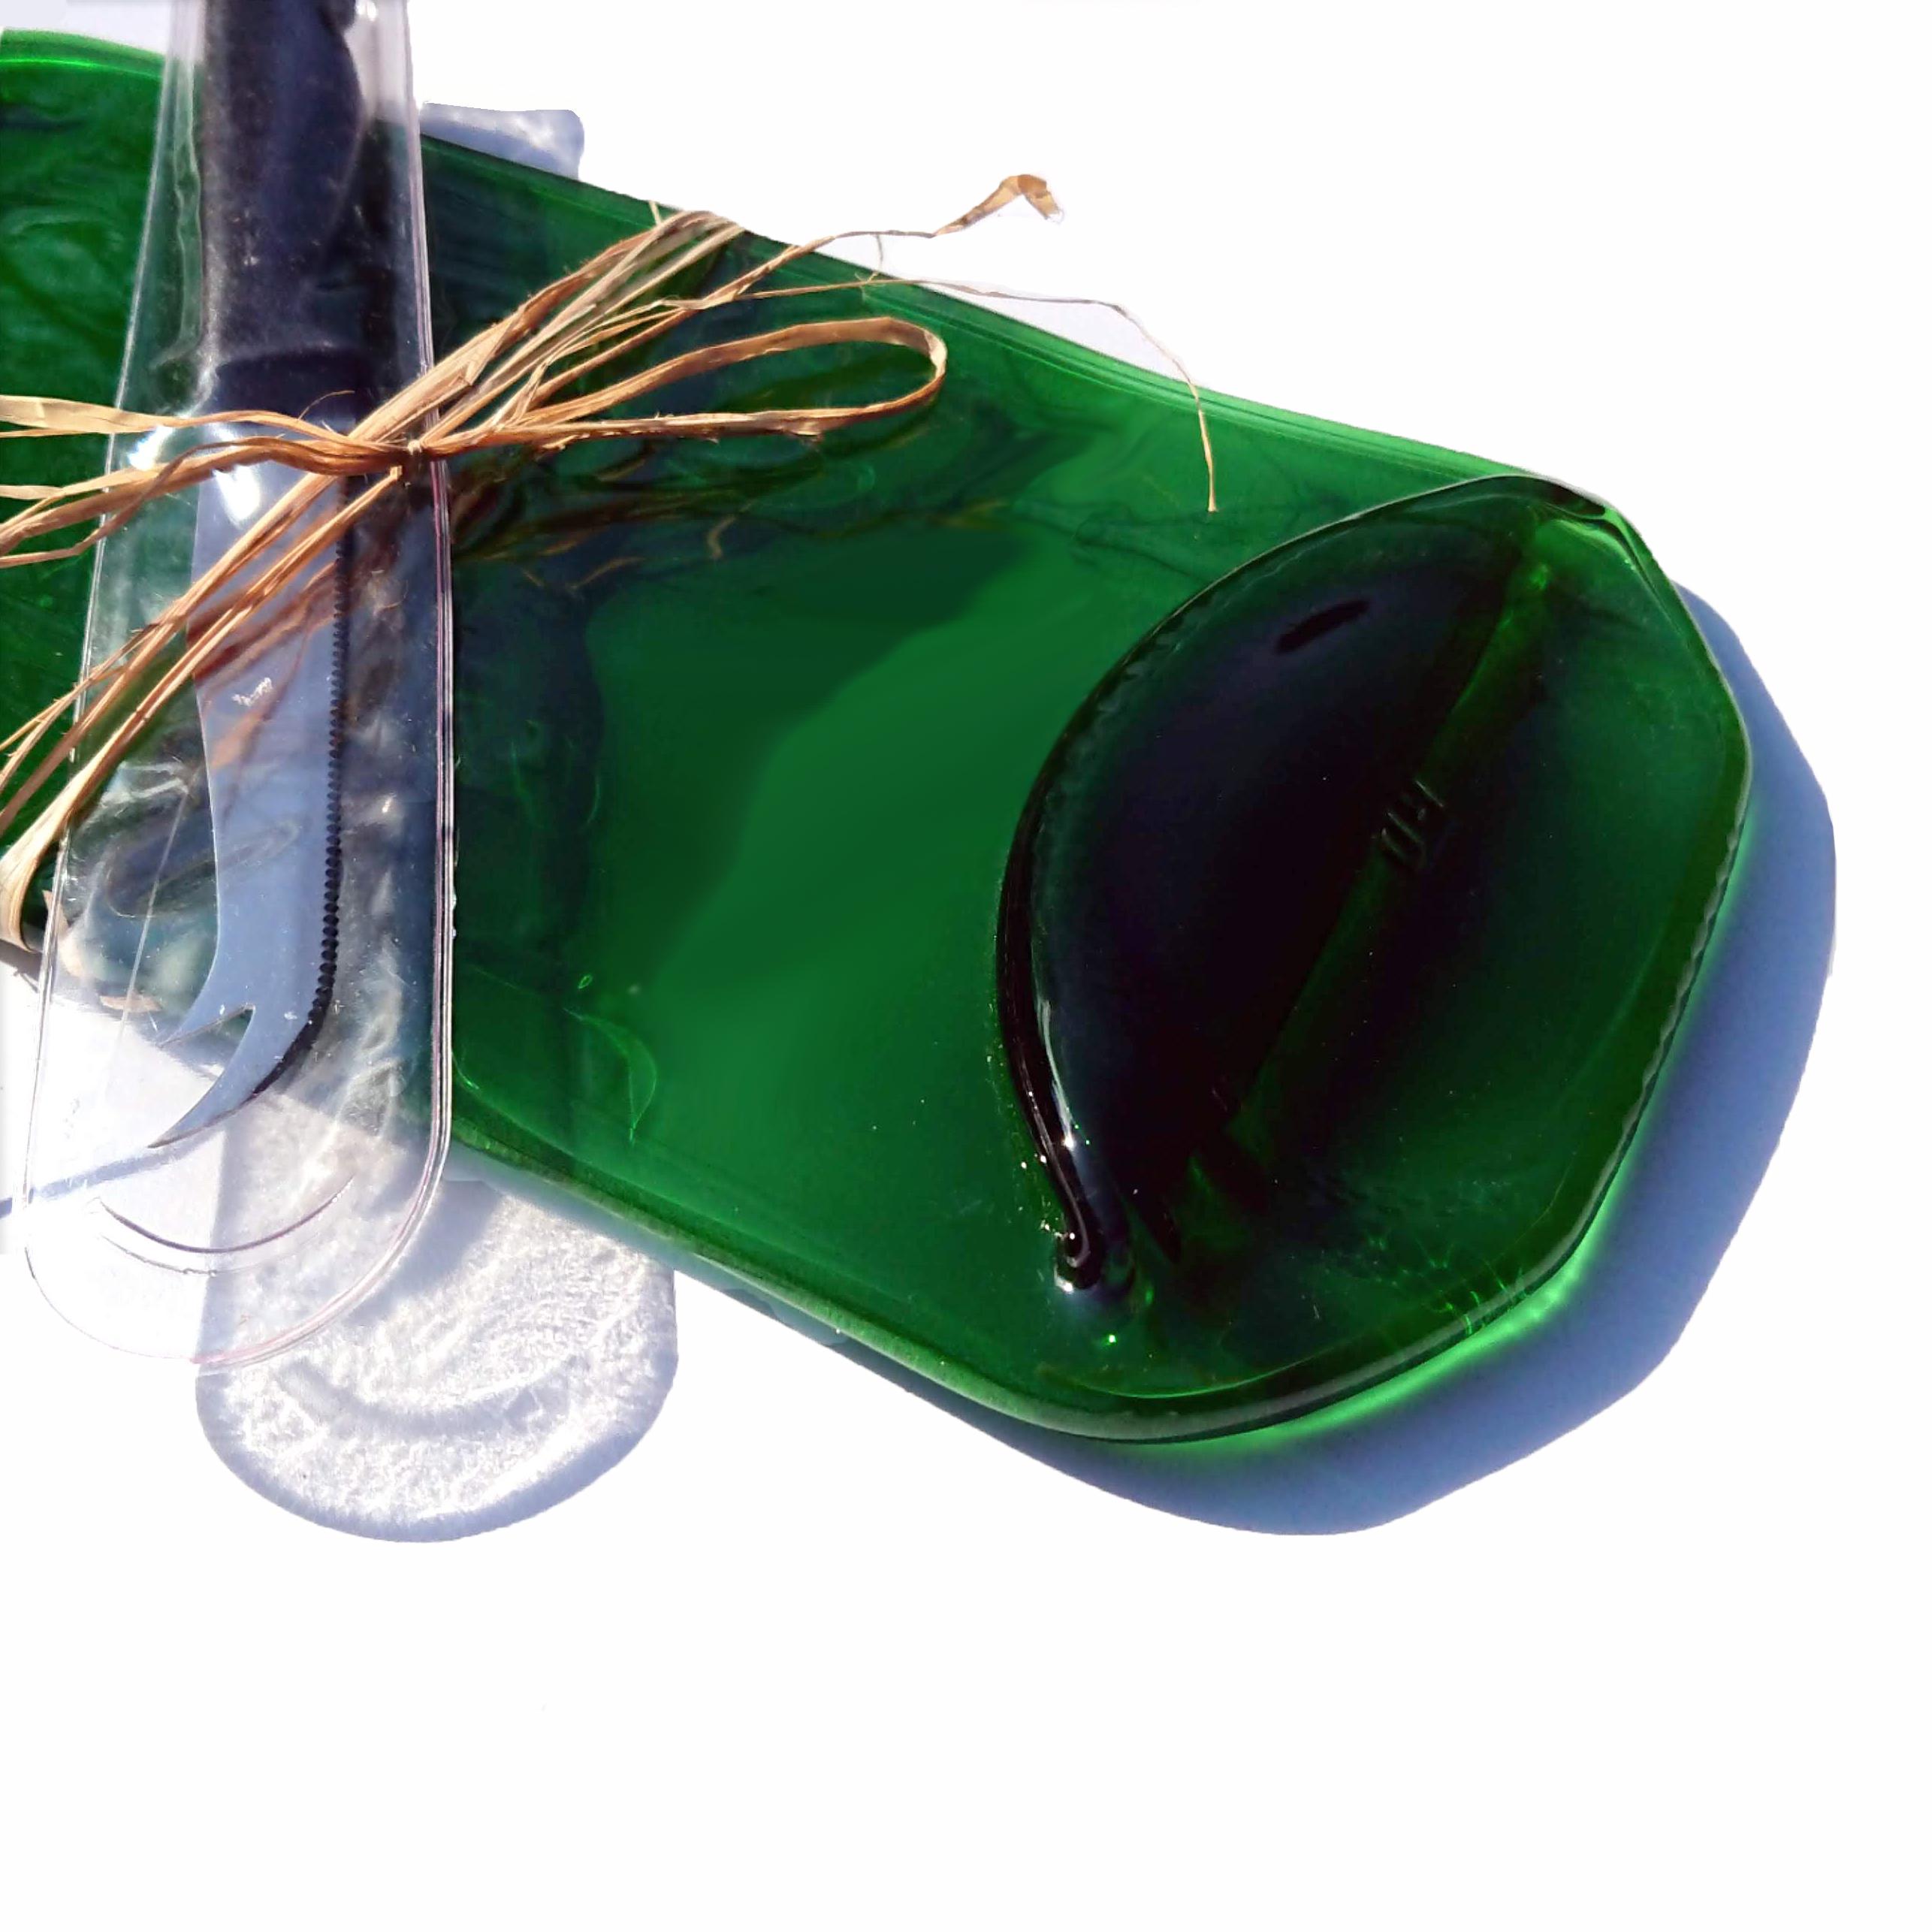 green-cheeseboard